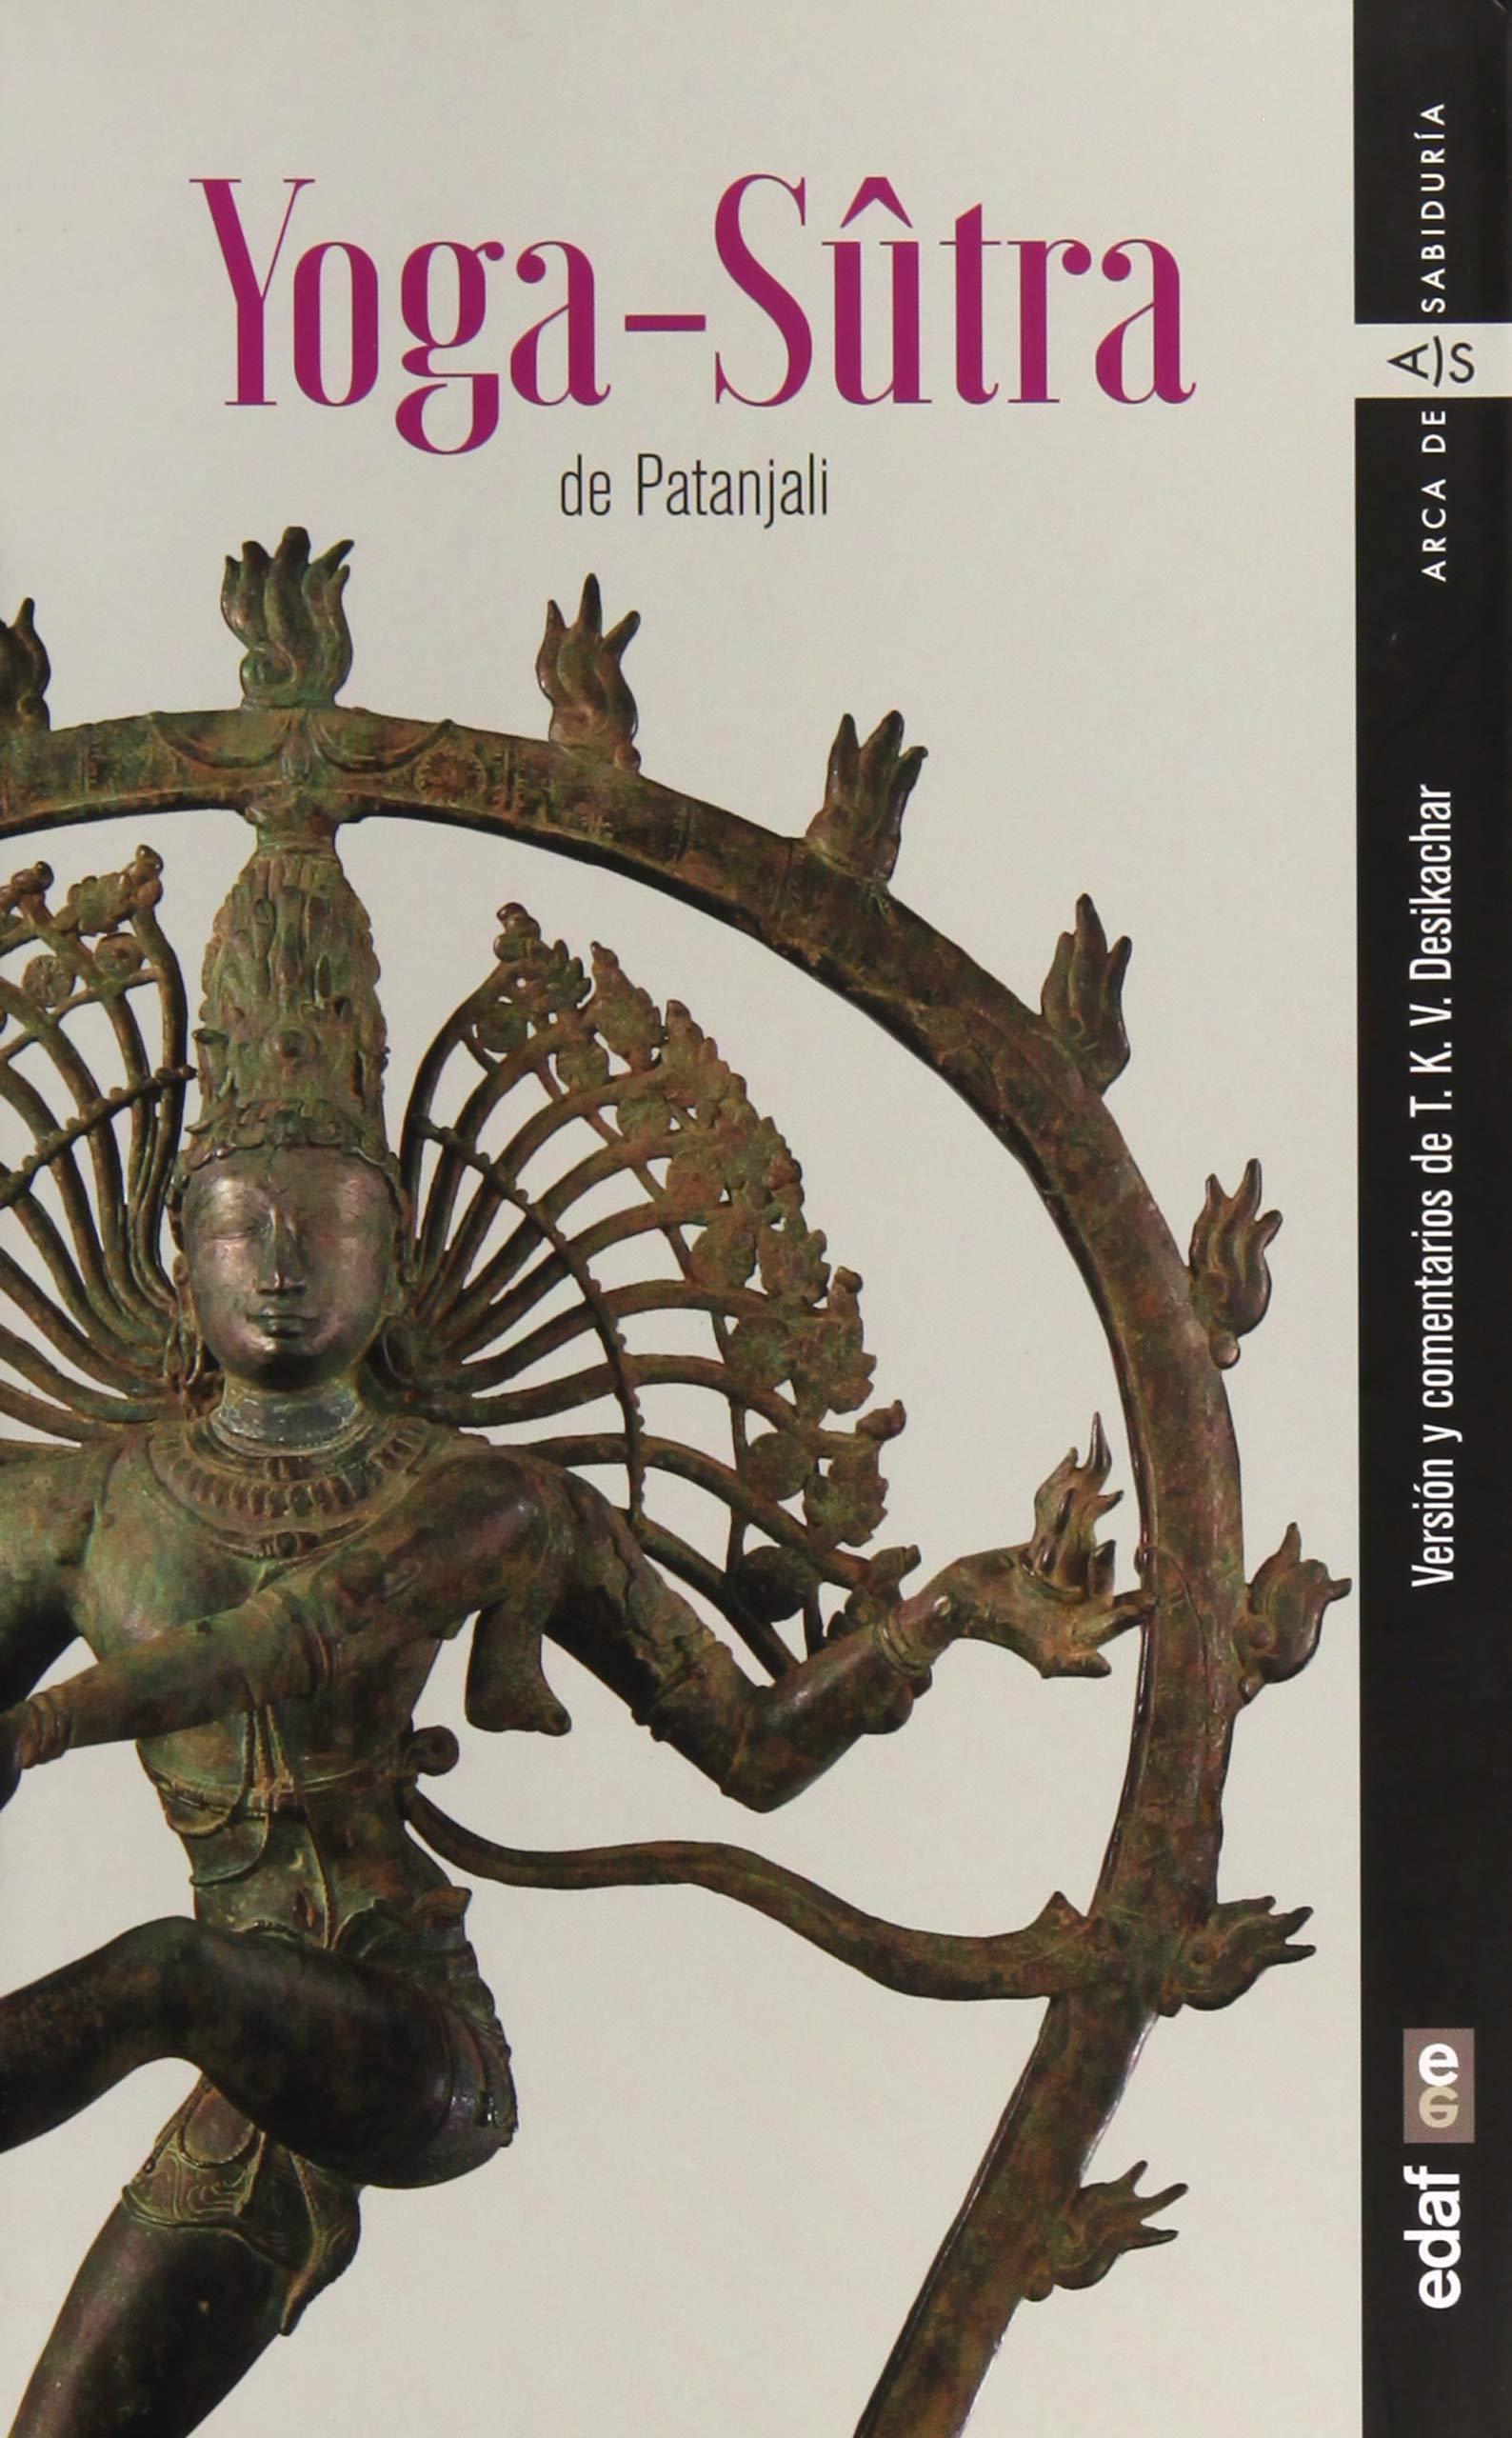 Yoga-Sutra de Patanjali (Spanish Edition): T.K.V. Desikachar ...